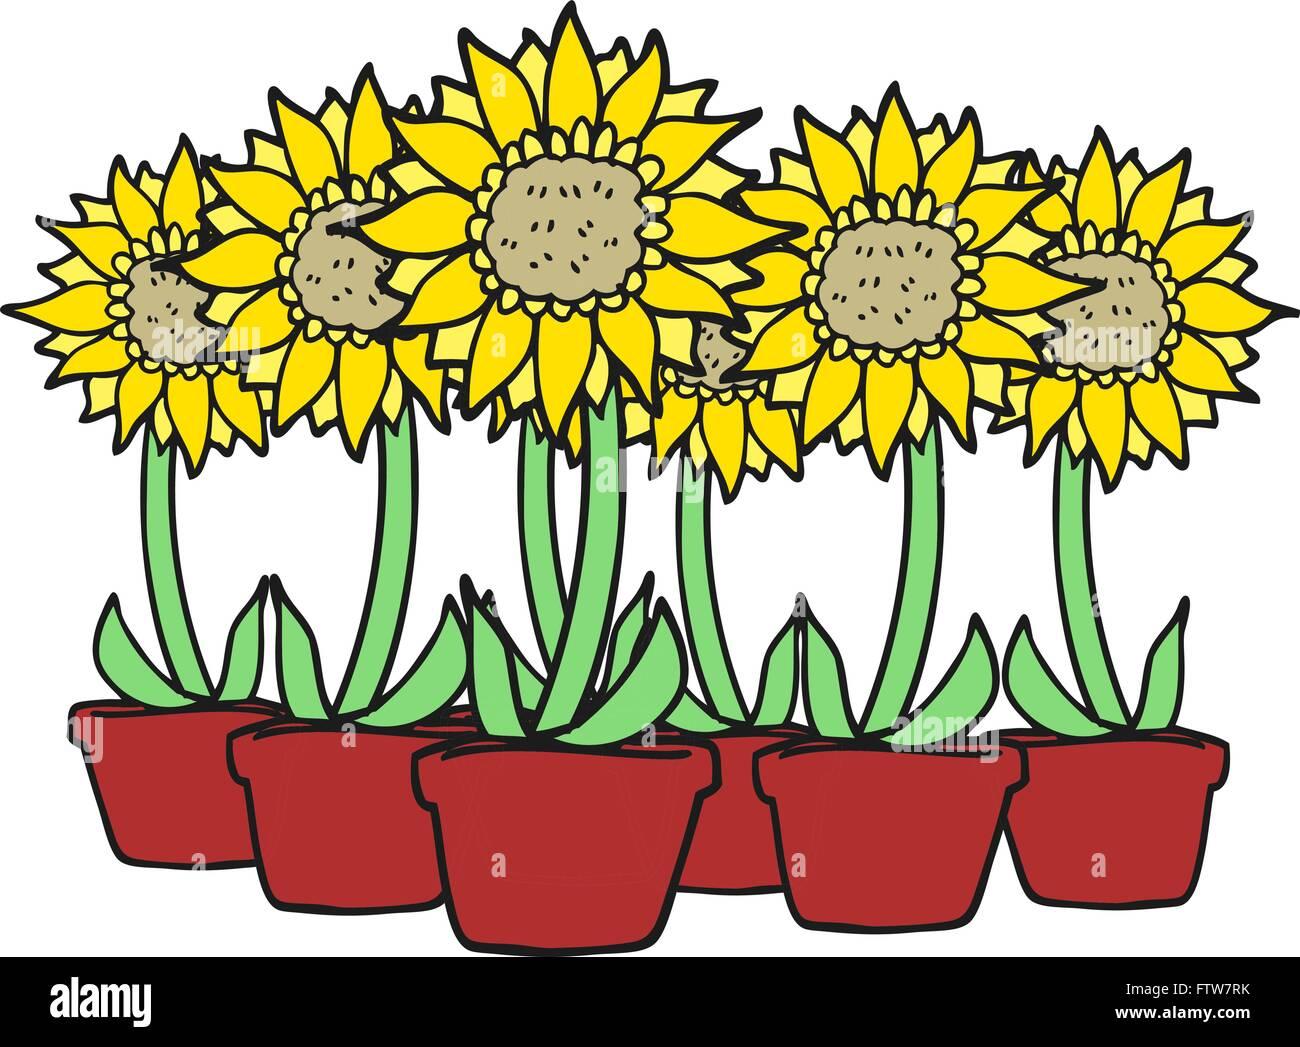 Freehand Drawn Cartoon Sunflowers